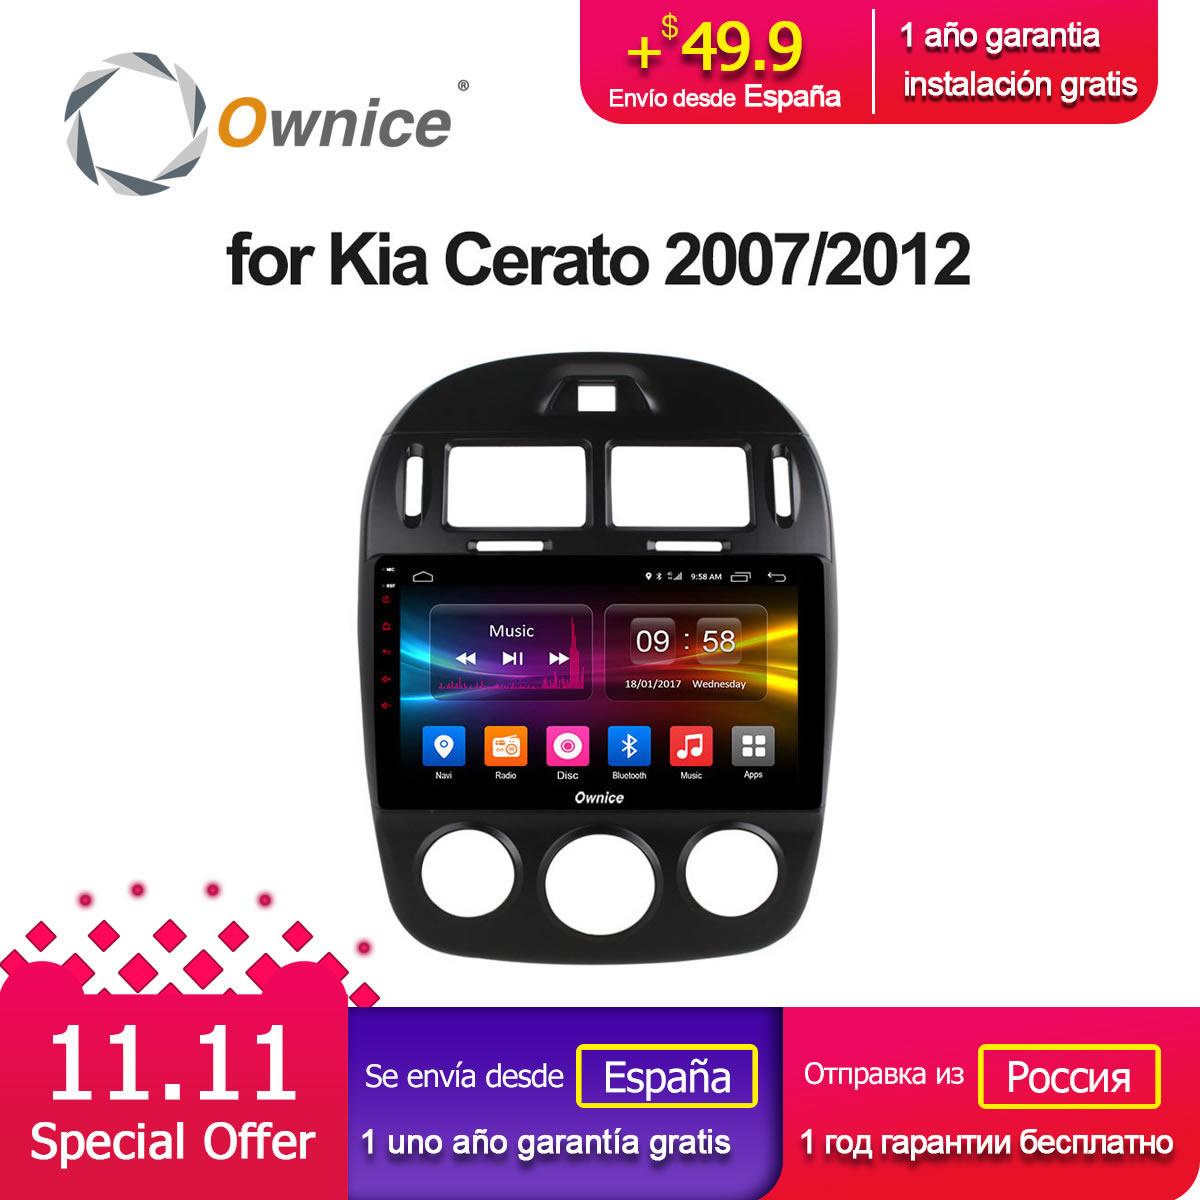 10.1 Ownice C500+ G10 Android 8.1 car head unit 8 Core for Kia Cerato 2007 - 2012 radio gps navigation palyer 2G RAM 4G LTE ownice c500 4g sim lte octa 8 core android 6 0 for kia ceed 2013 2015 car dvd player gps navi radio wifi 4g bt 2gb ram 32g rom